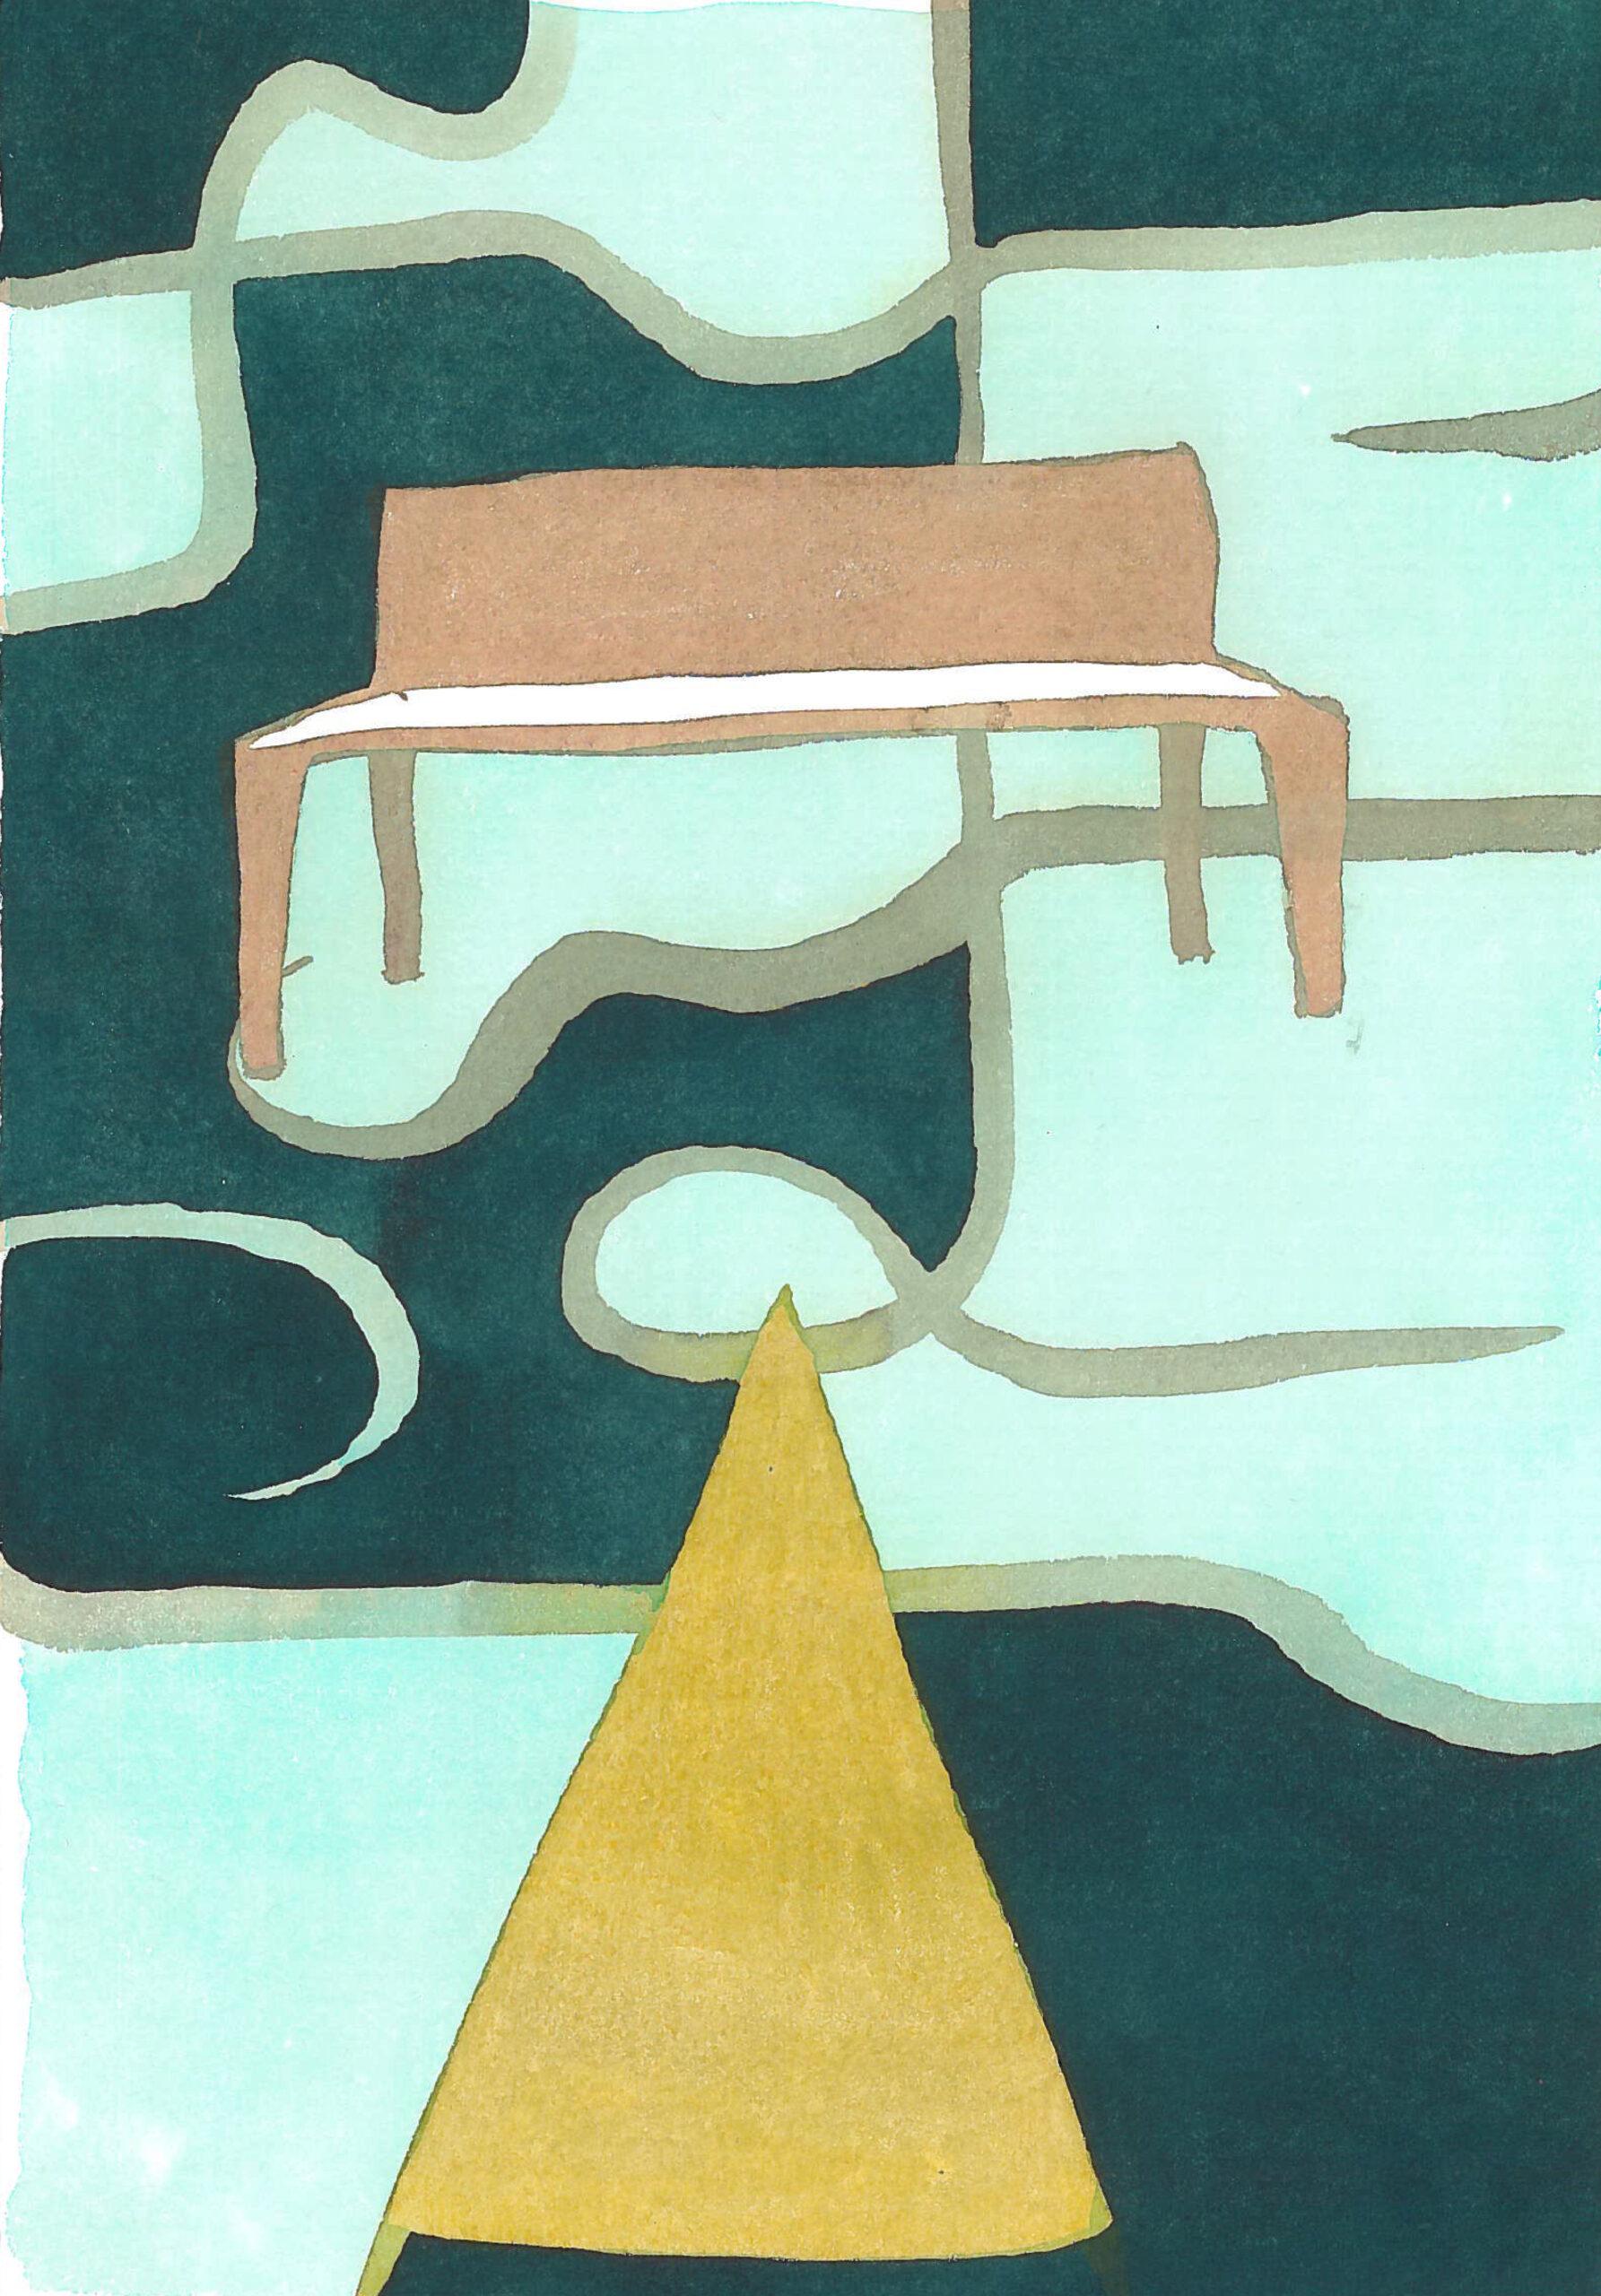 According to Romain Gary Cute. Boa. Watercolor on print paper. 39x27,5cm 2017